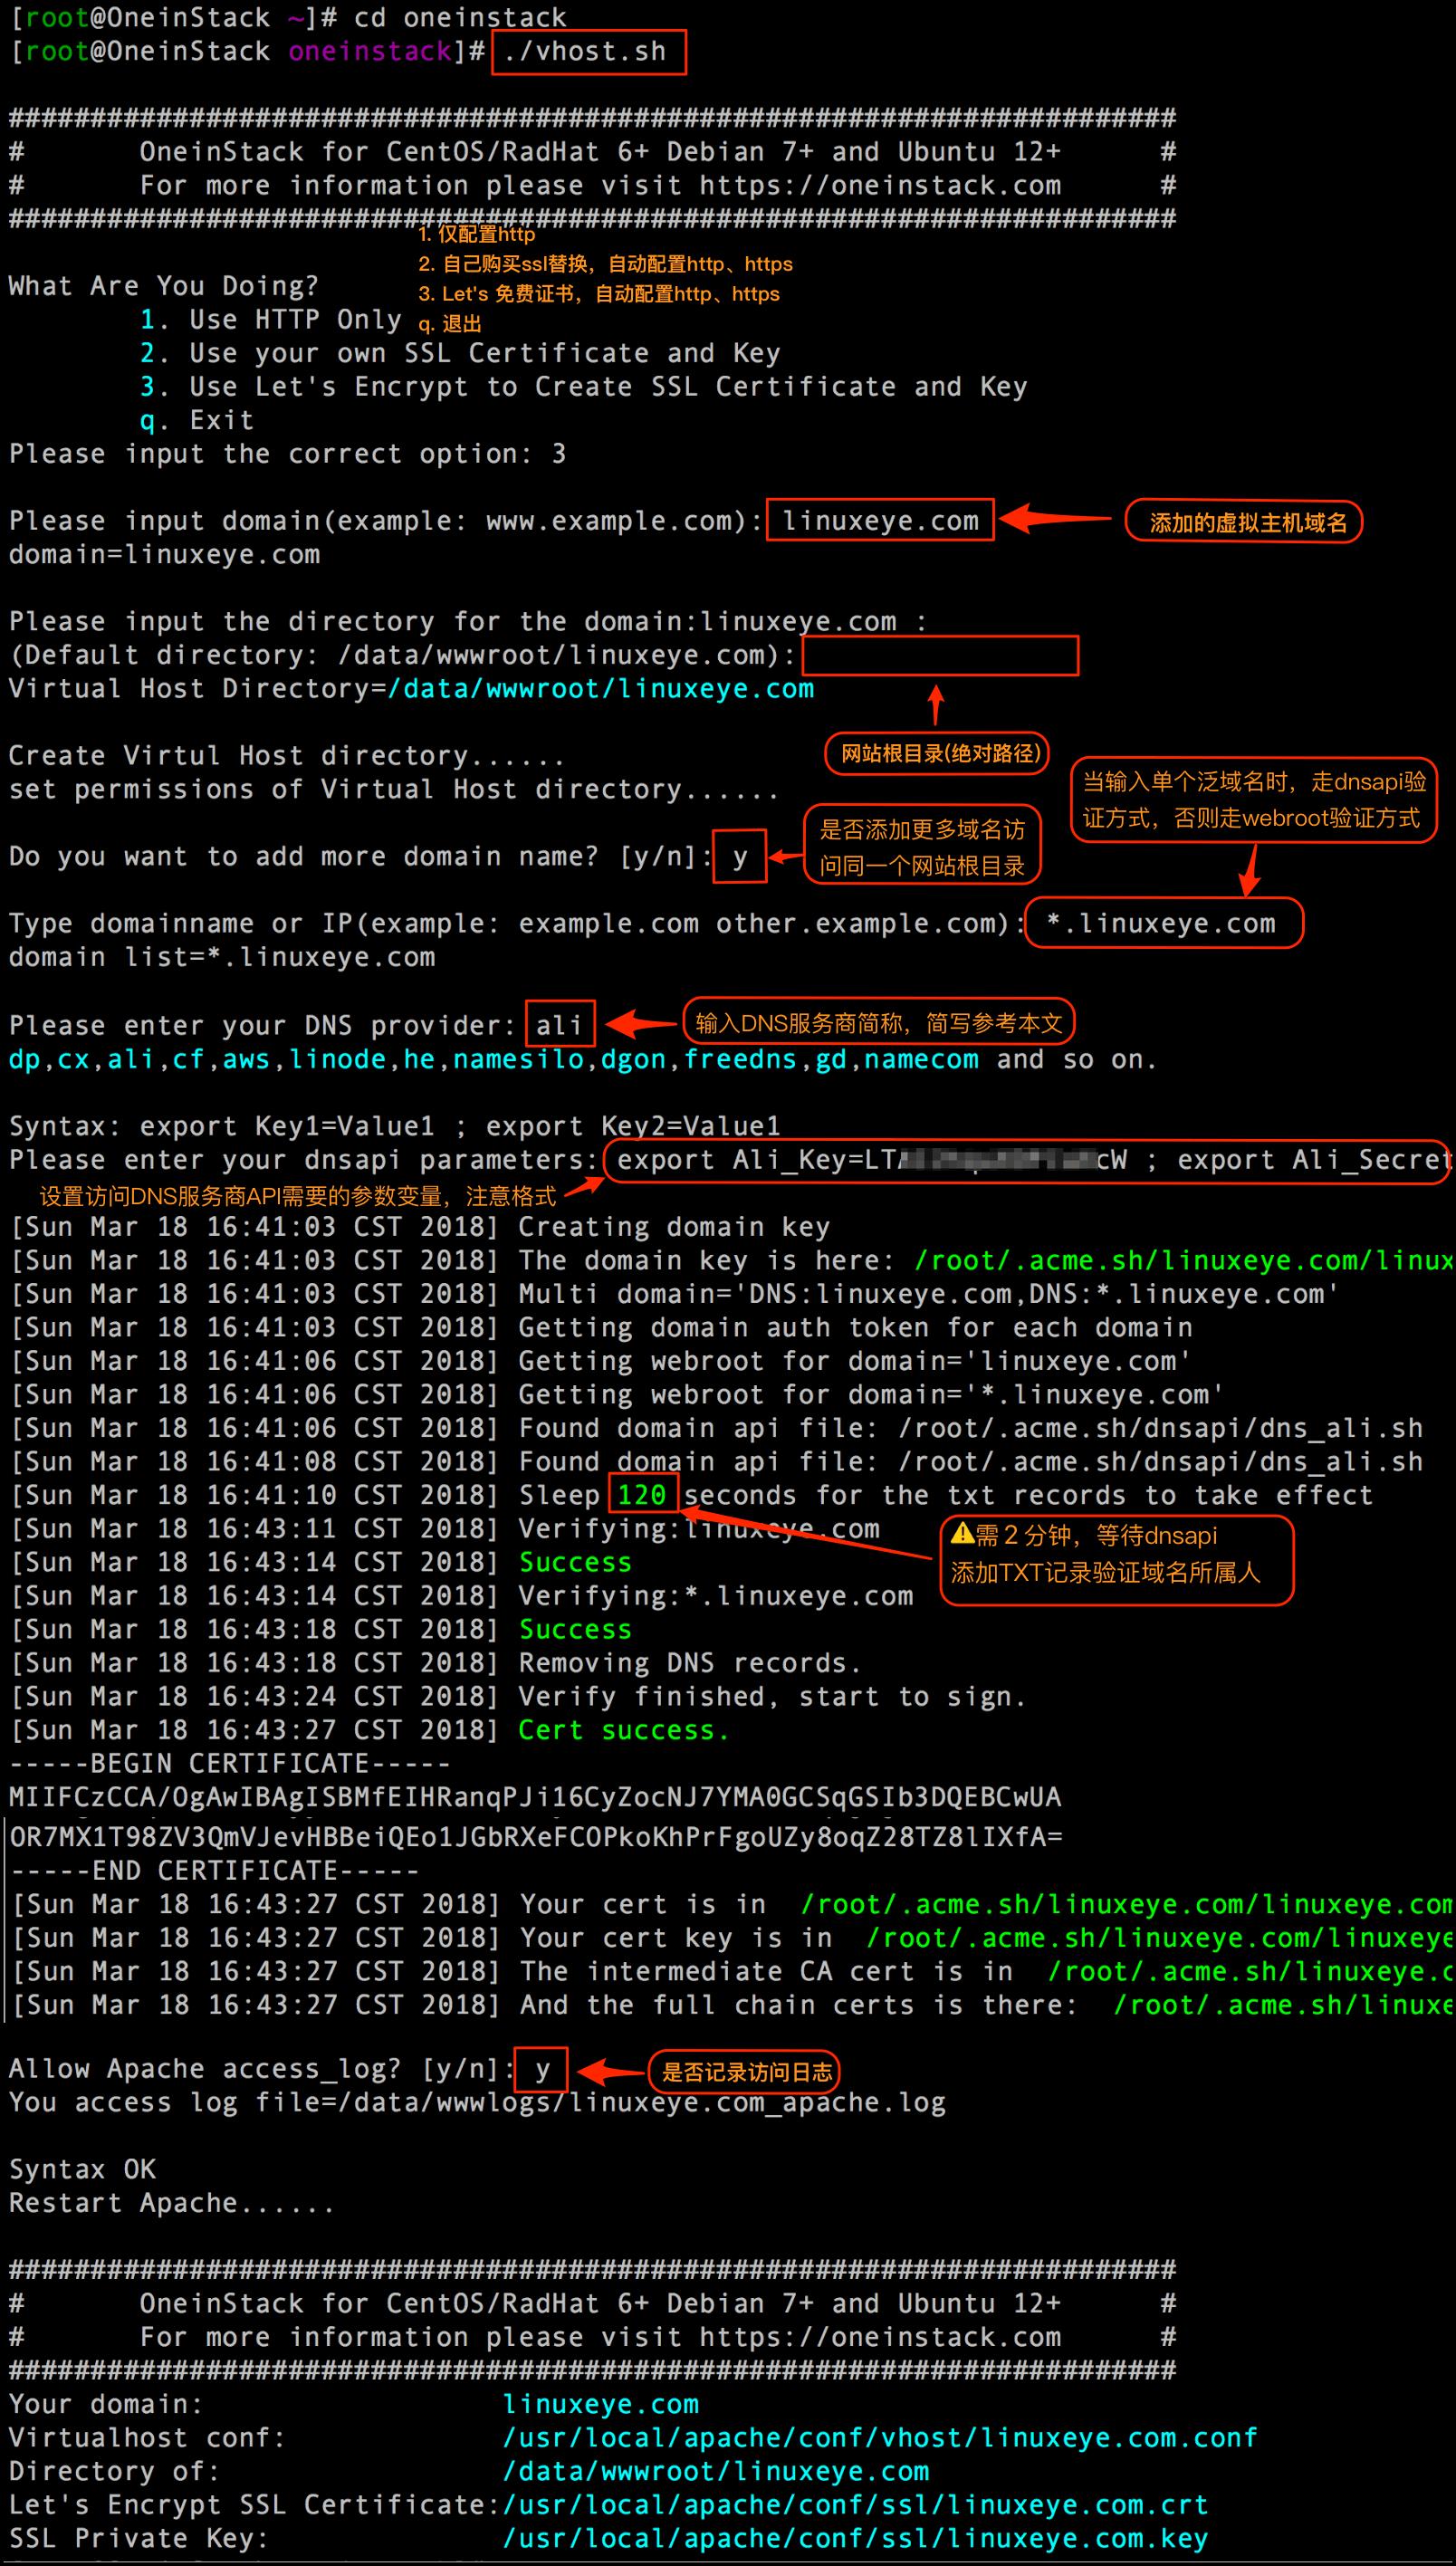 OneinStack Let's Encrypt 免费SSL证书教程